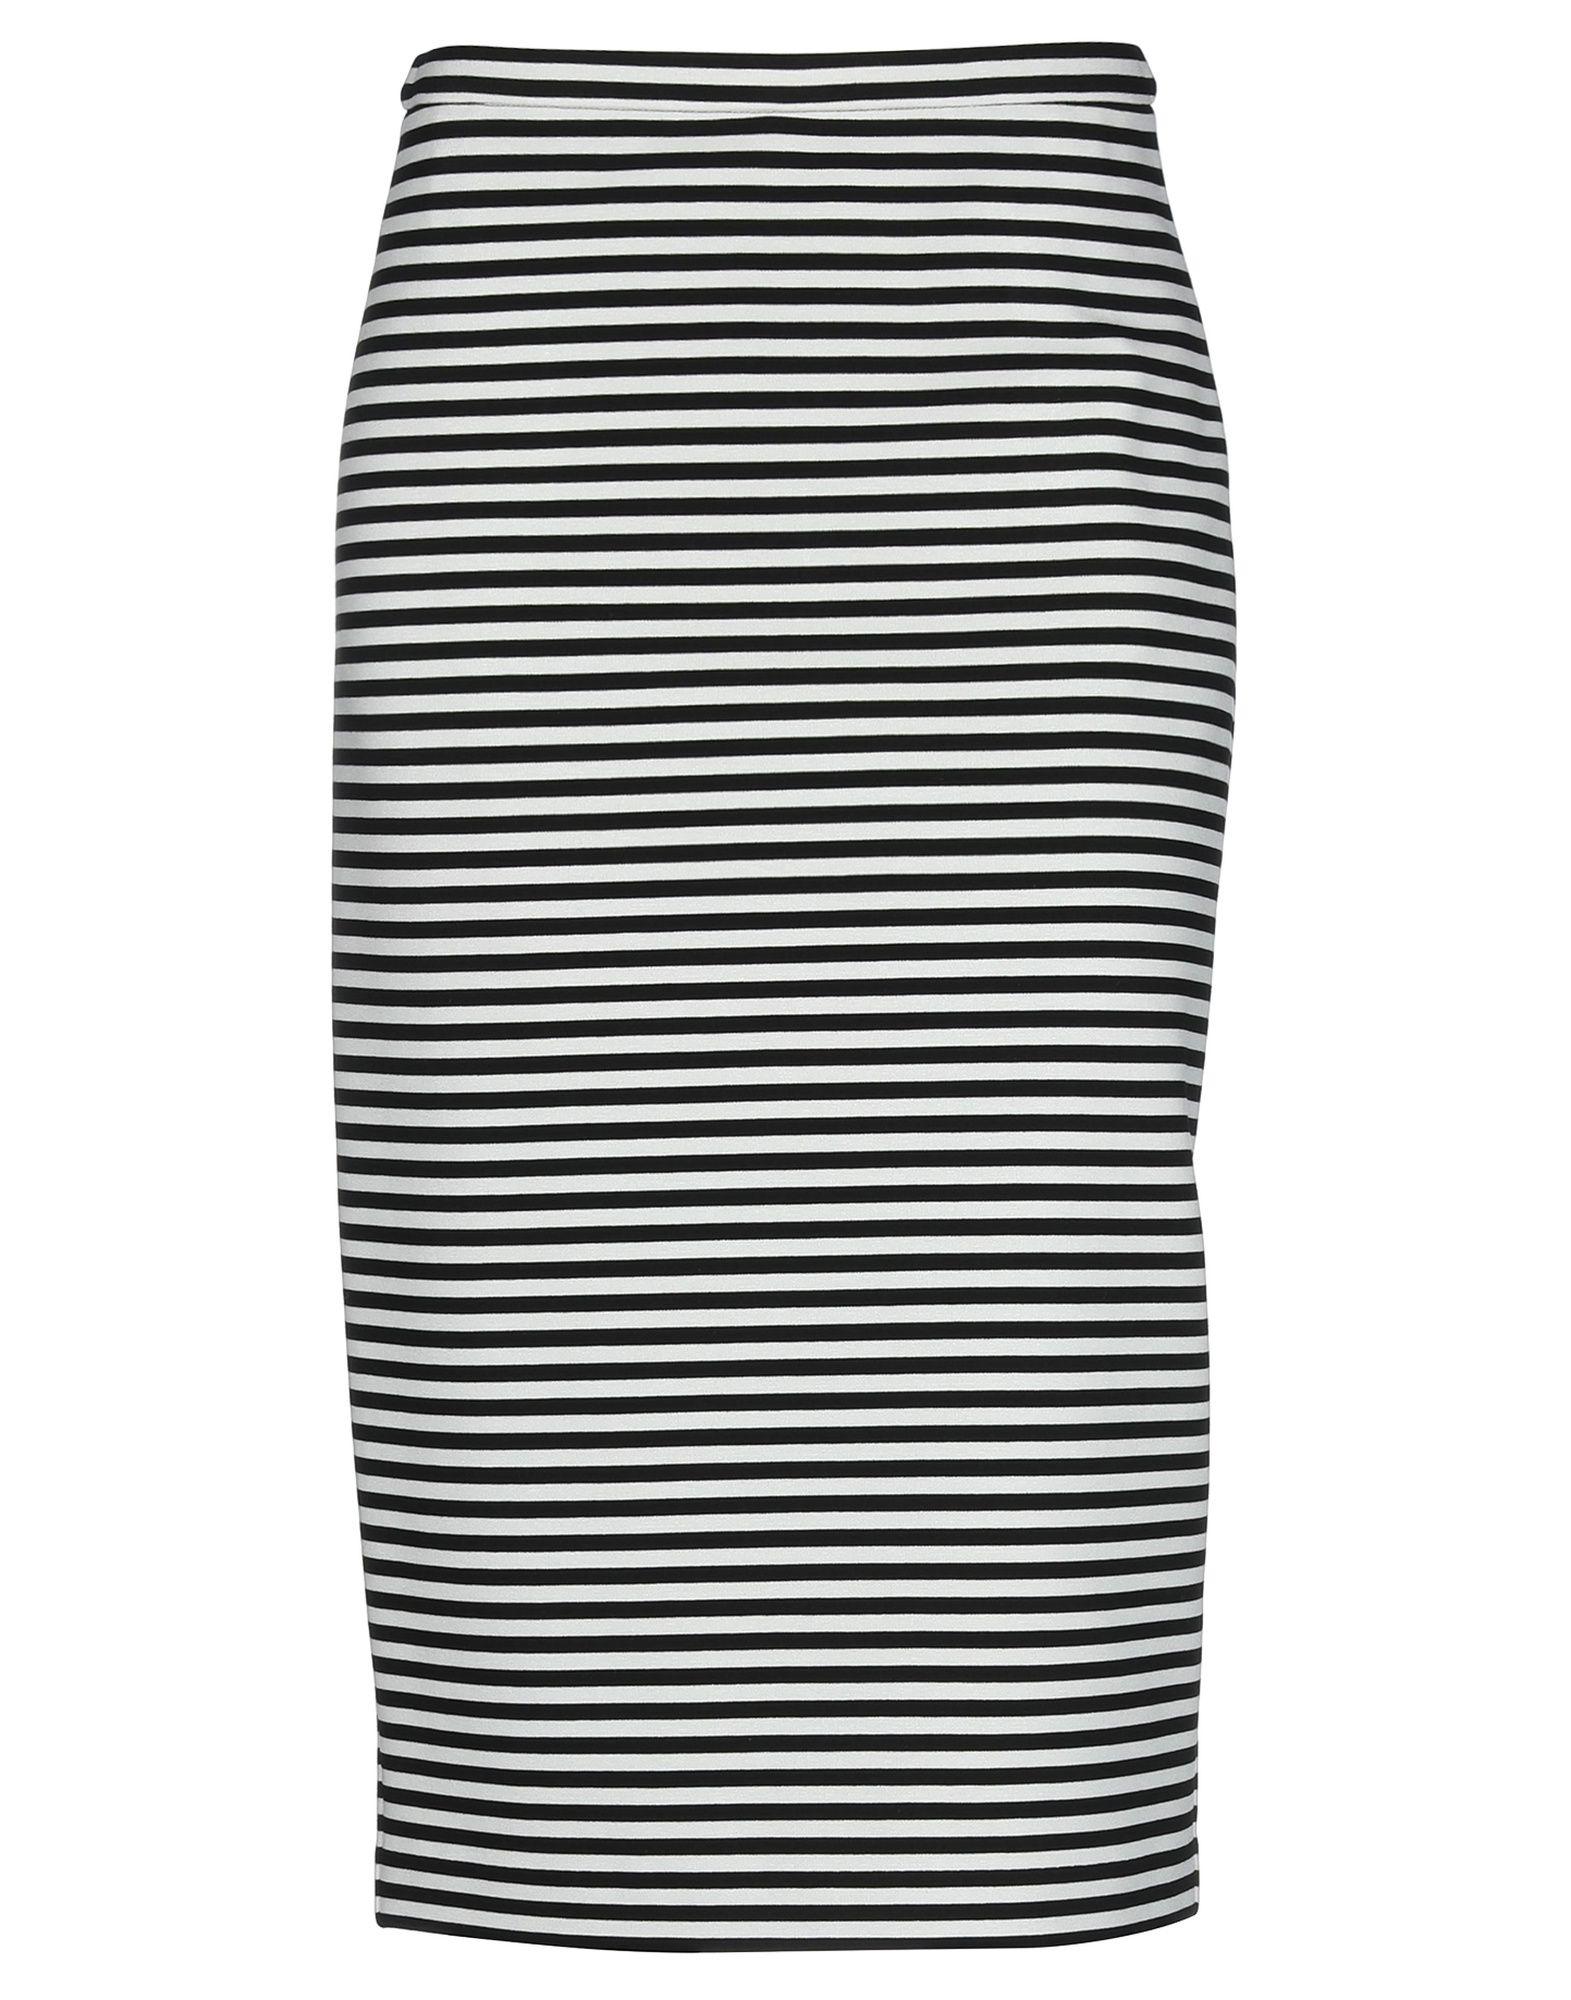 MAX MARA Юбка длиной 3/4 max mara юбка длиной 3 4